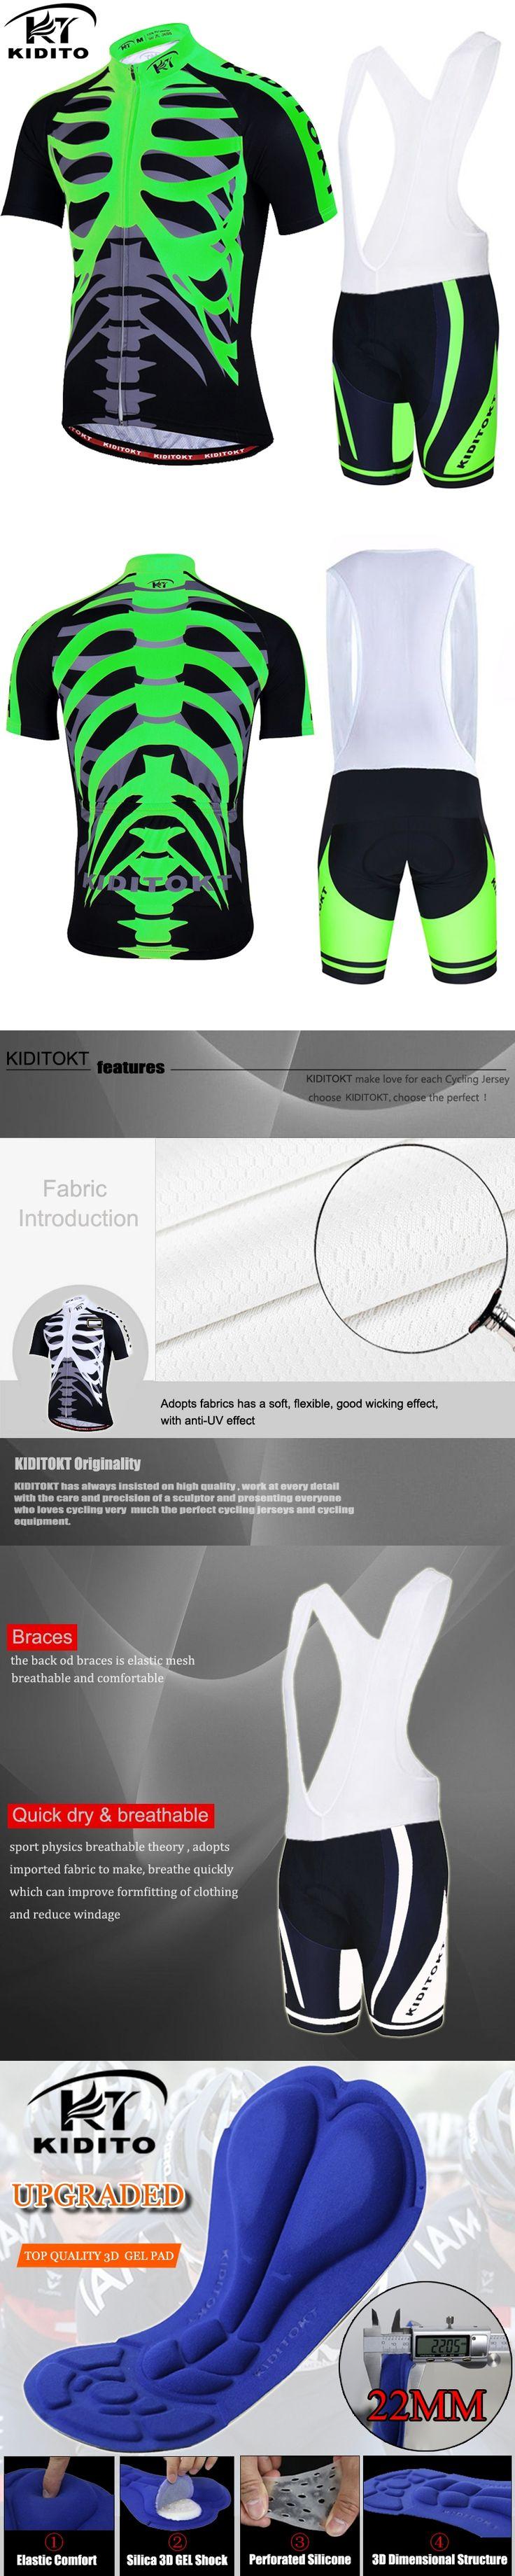 KIDITOKT Pro Cycling Jersey set/ Bike uniform Cycle shirt Ropa ciclismo/ Bicycle Clothing Wear MTB Cycling Clothing Cycling Set